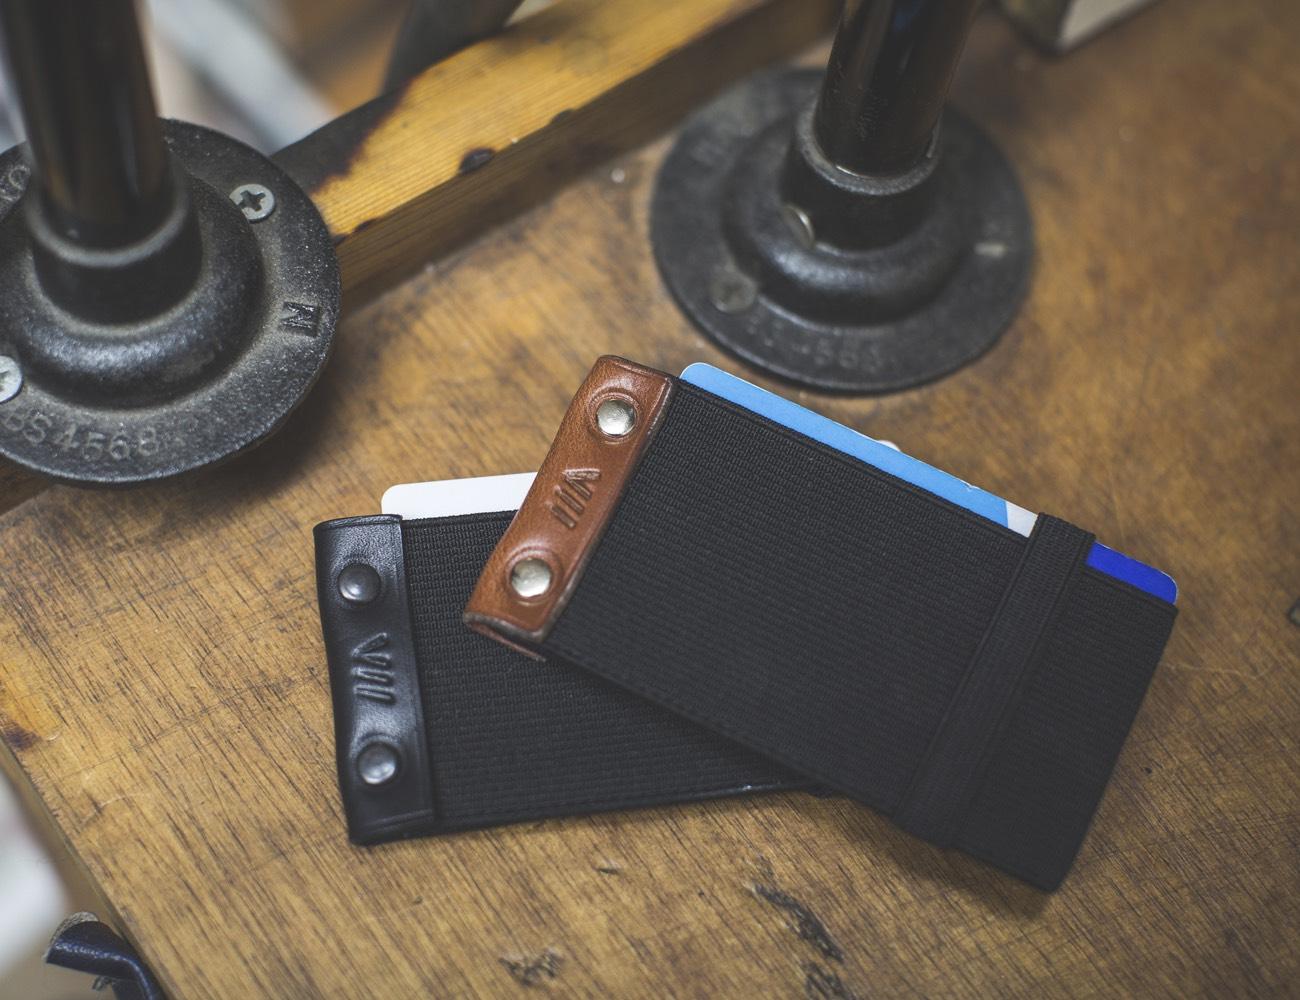 Flip 3.0 – The Ultimate Minimal Card Wallet